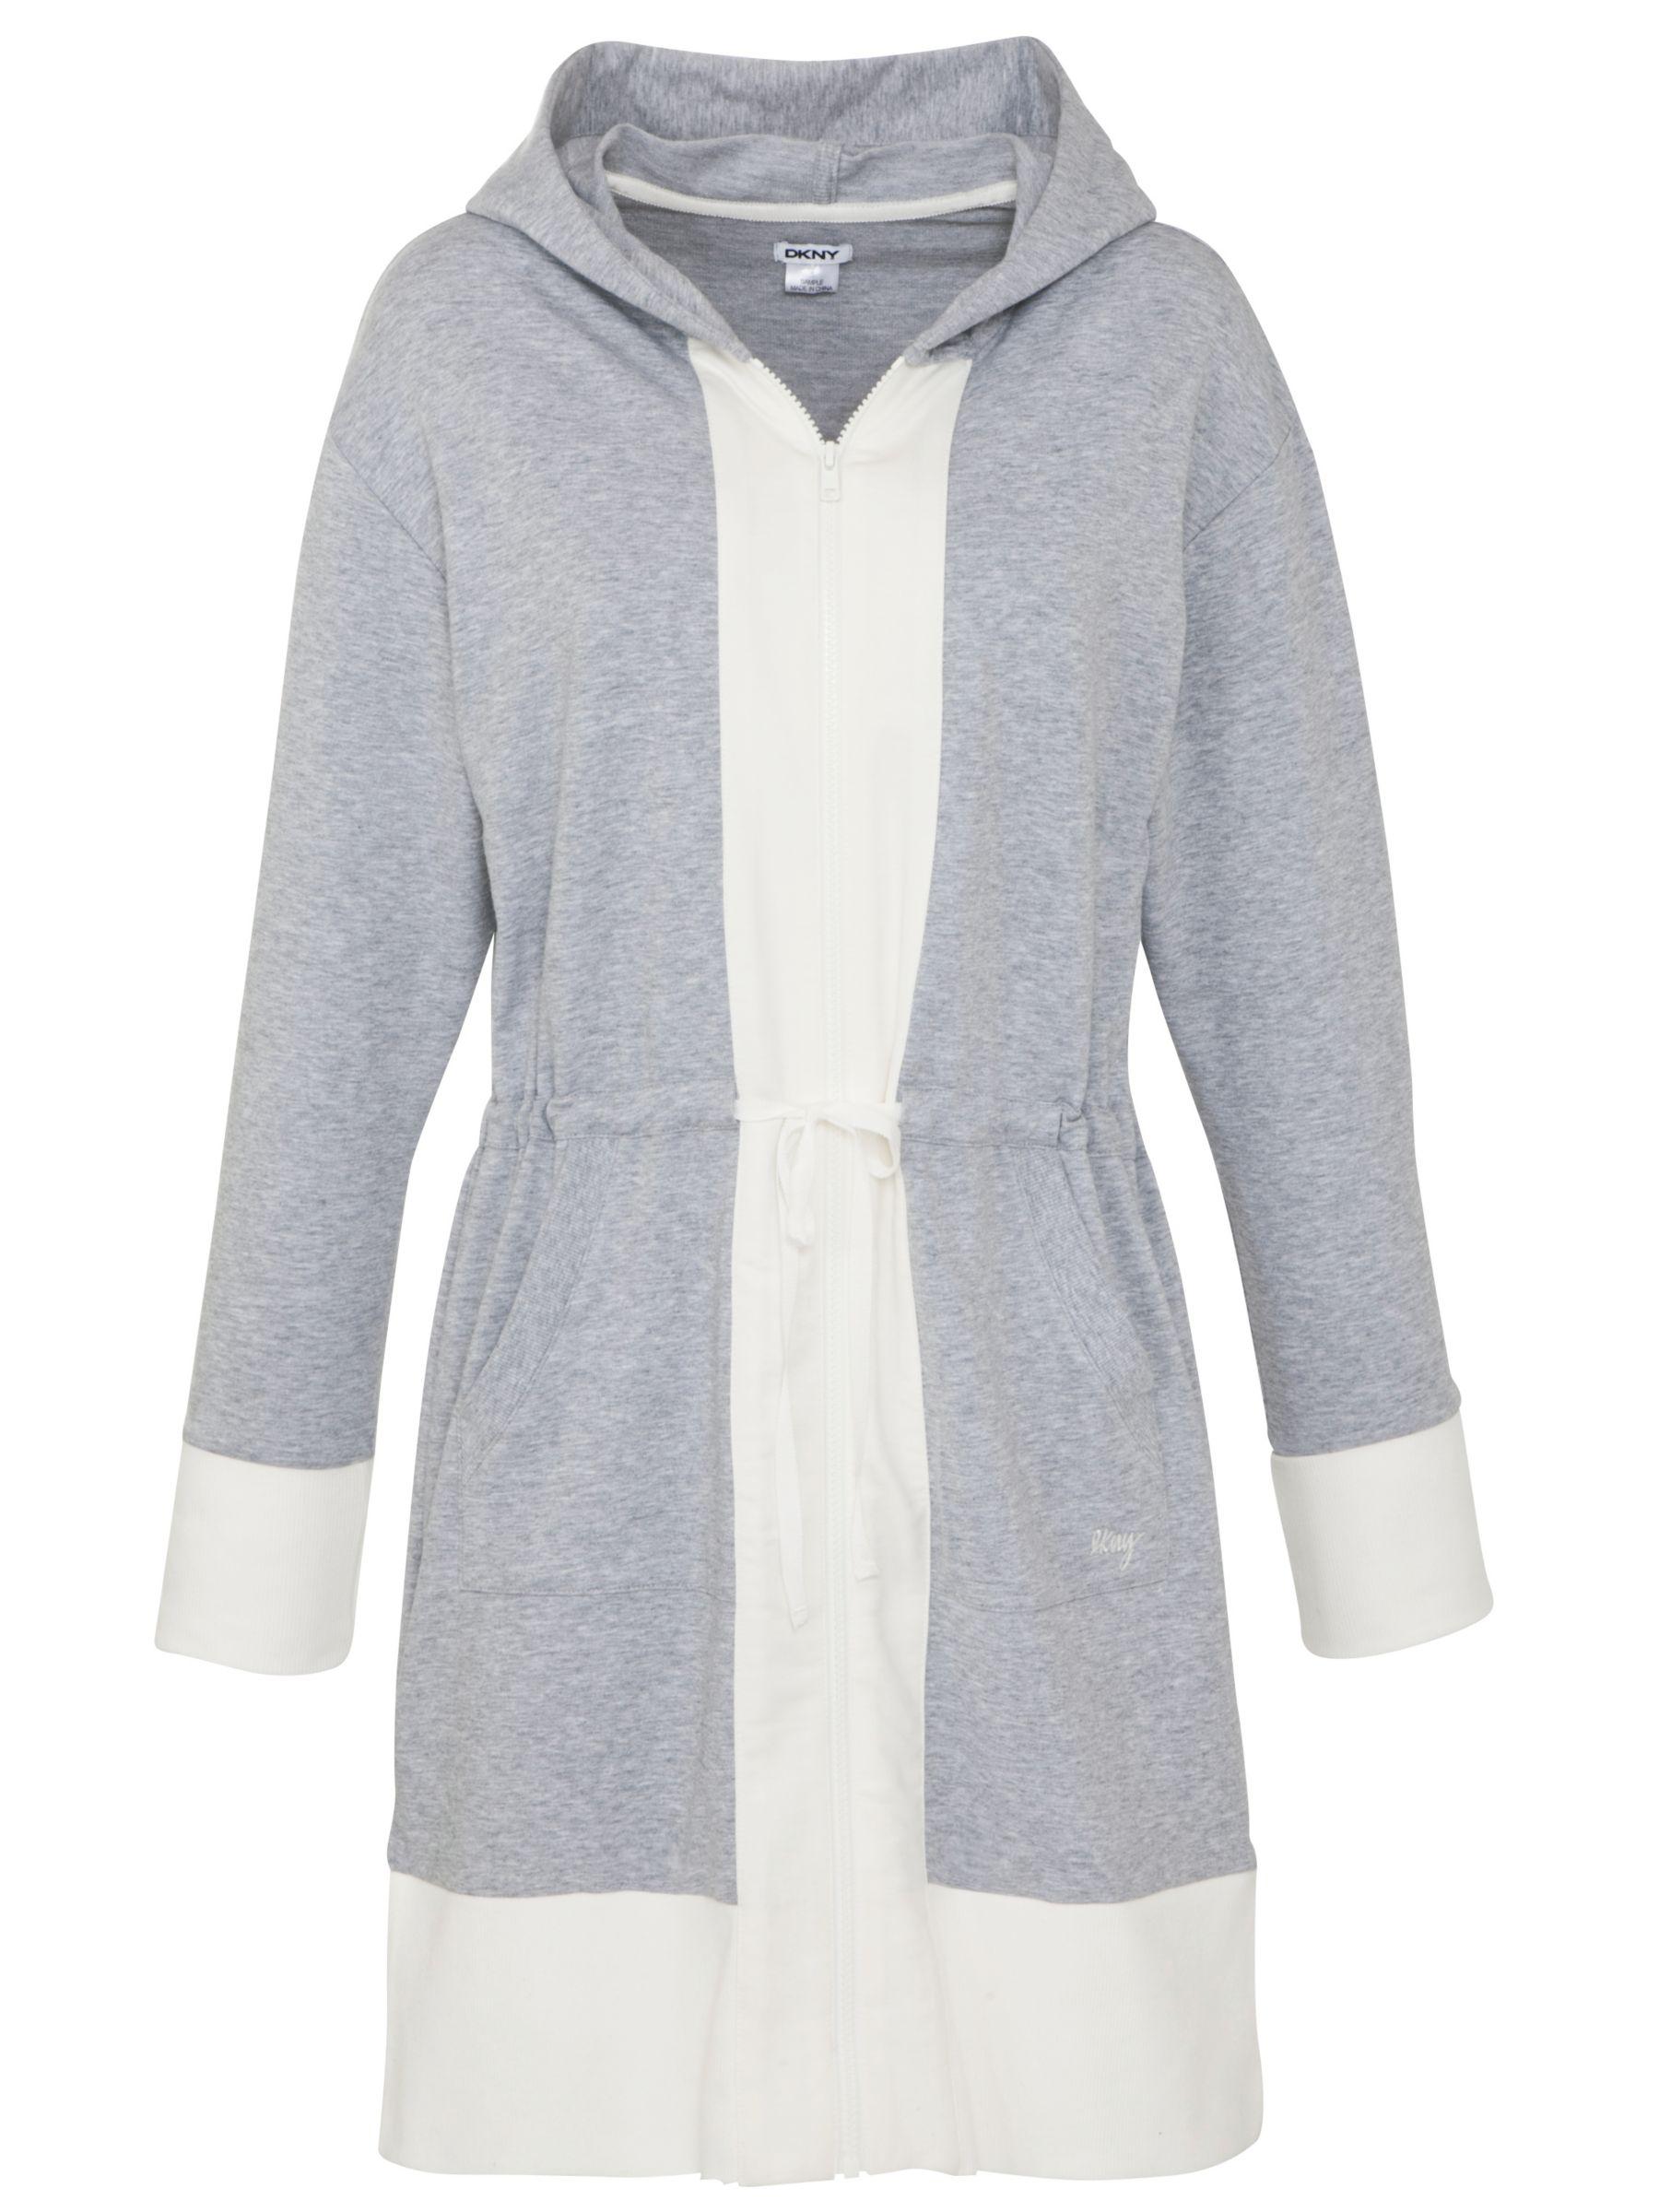 DKNY Hooded Sleepshirt, Grey